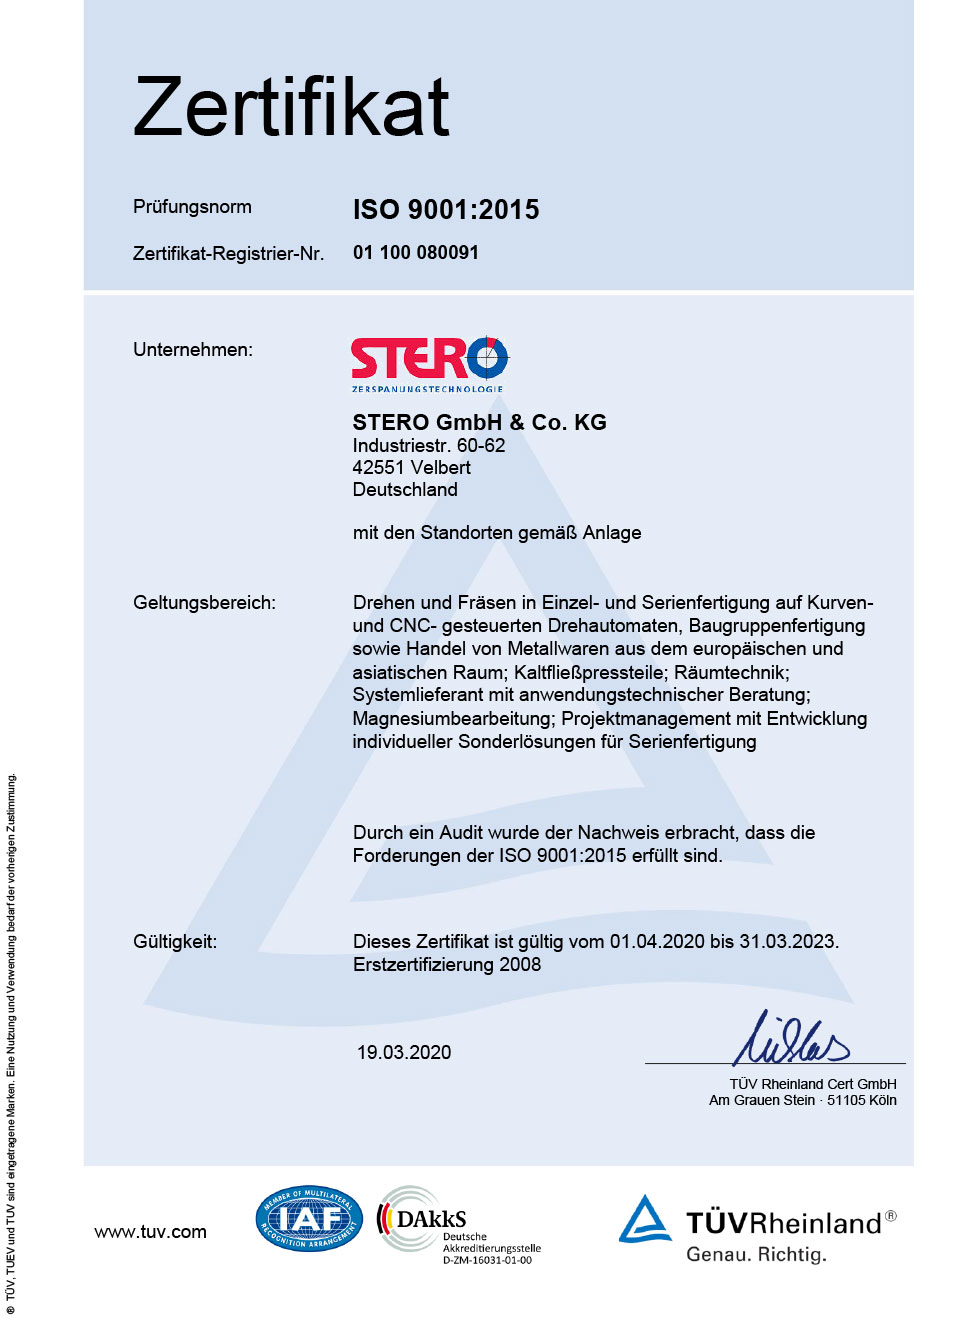 Zertifikat 2020-2023